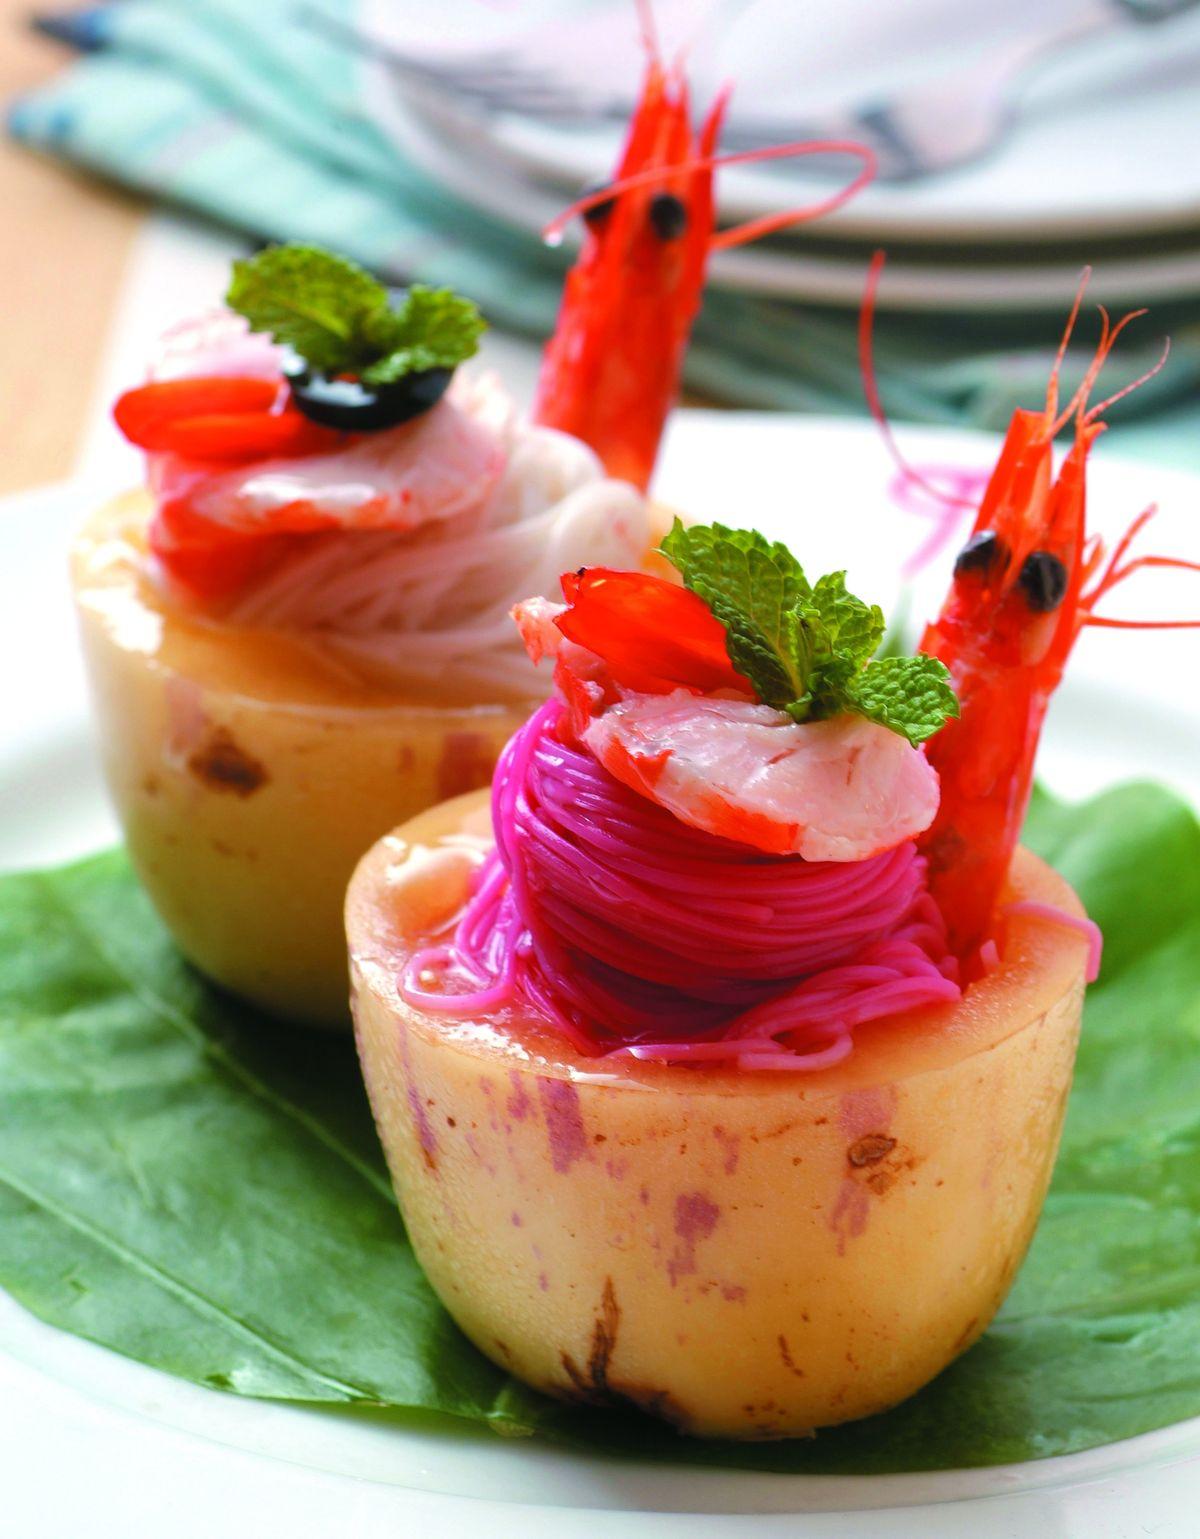 食譜:水果蝦楊梅麵